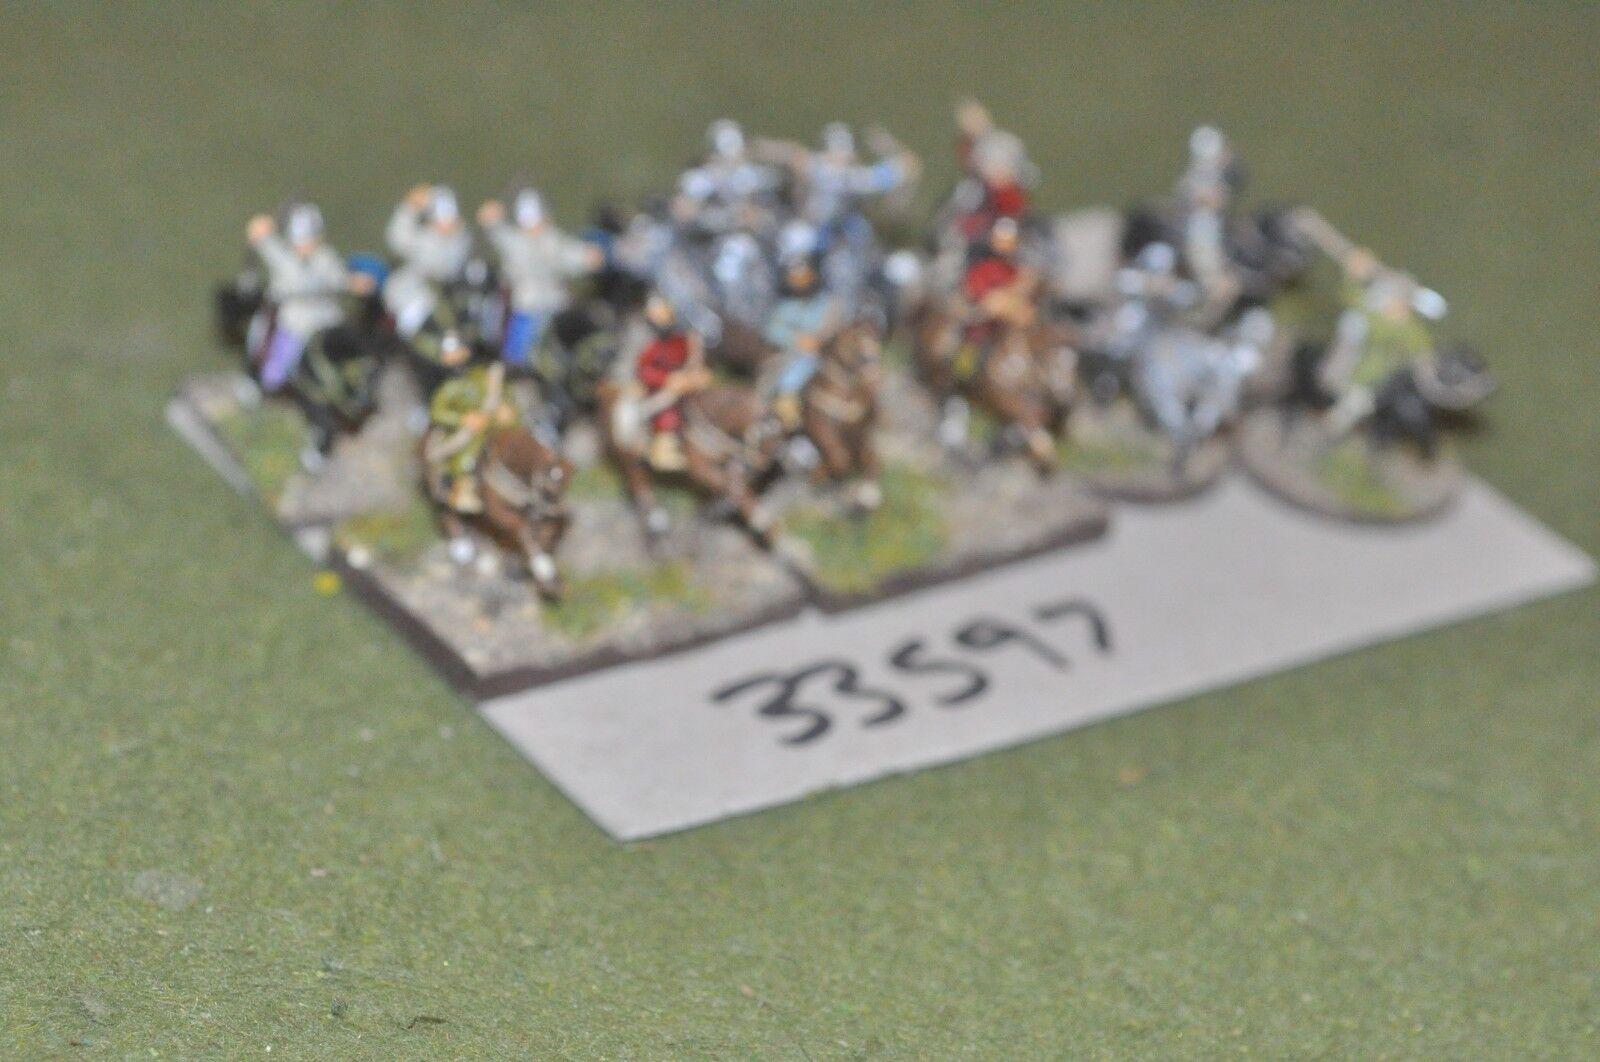 15mm dark ages   turkish - battle group 14 figures - cav (33597)